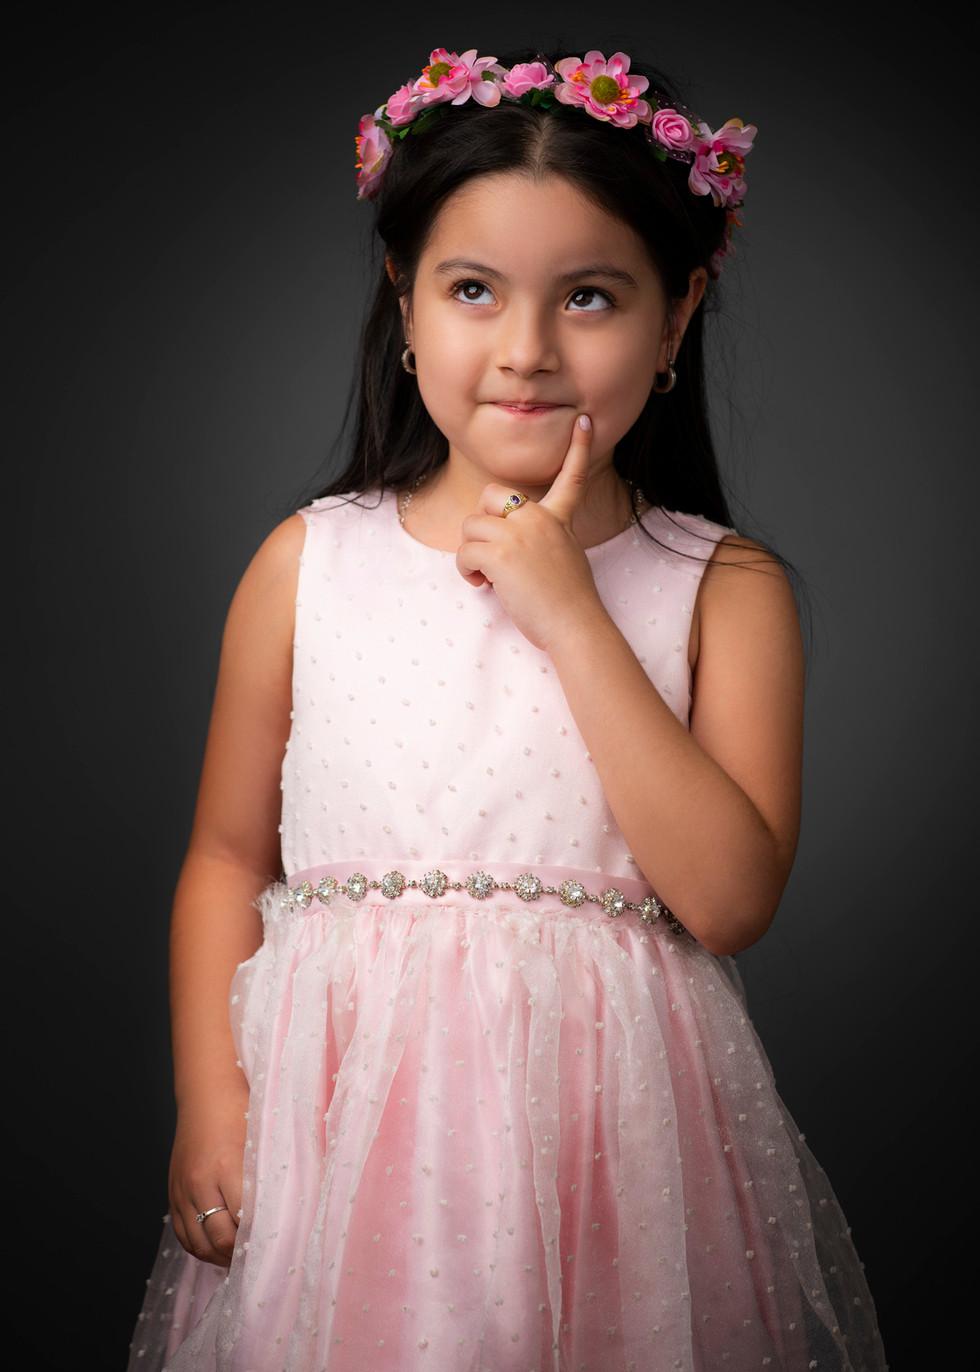 Professional portrait of a little girl